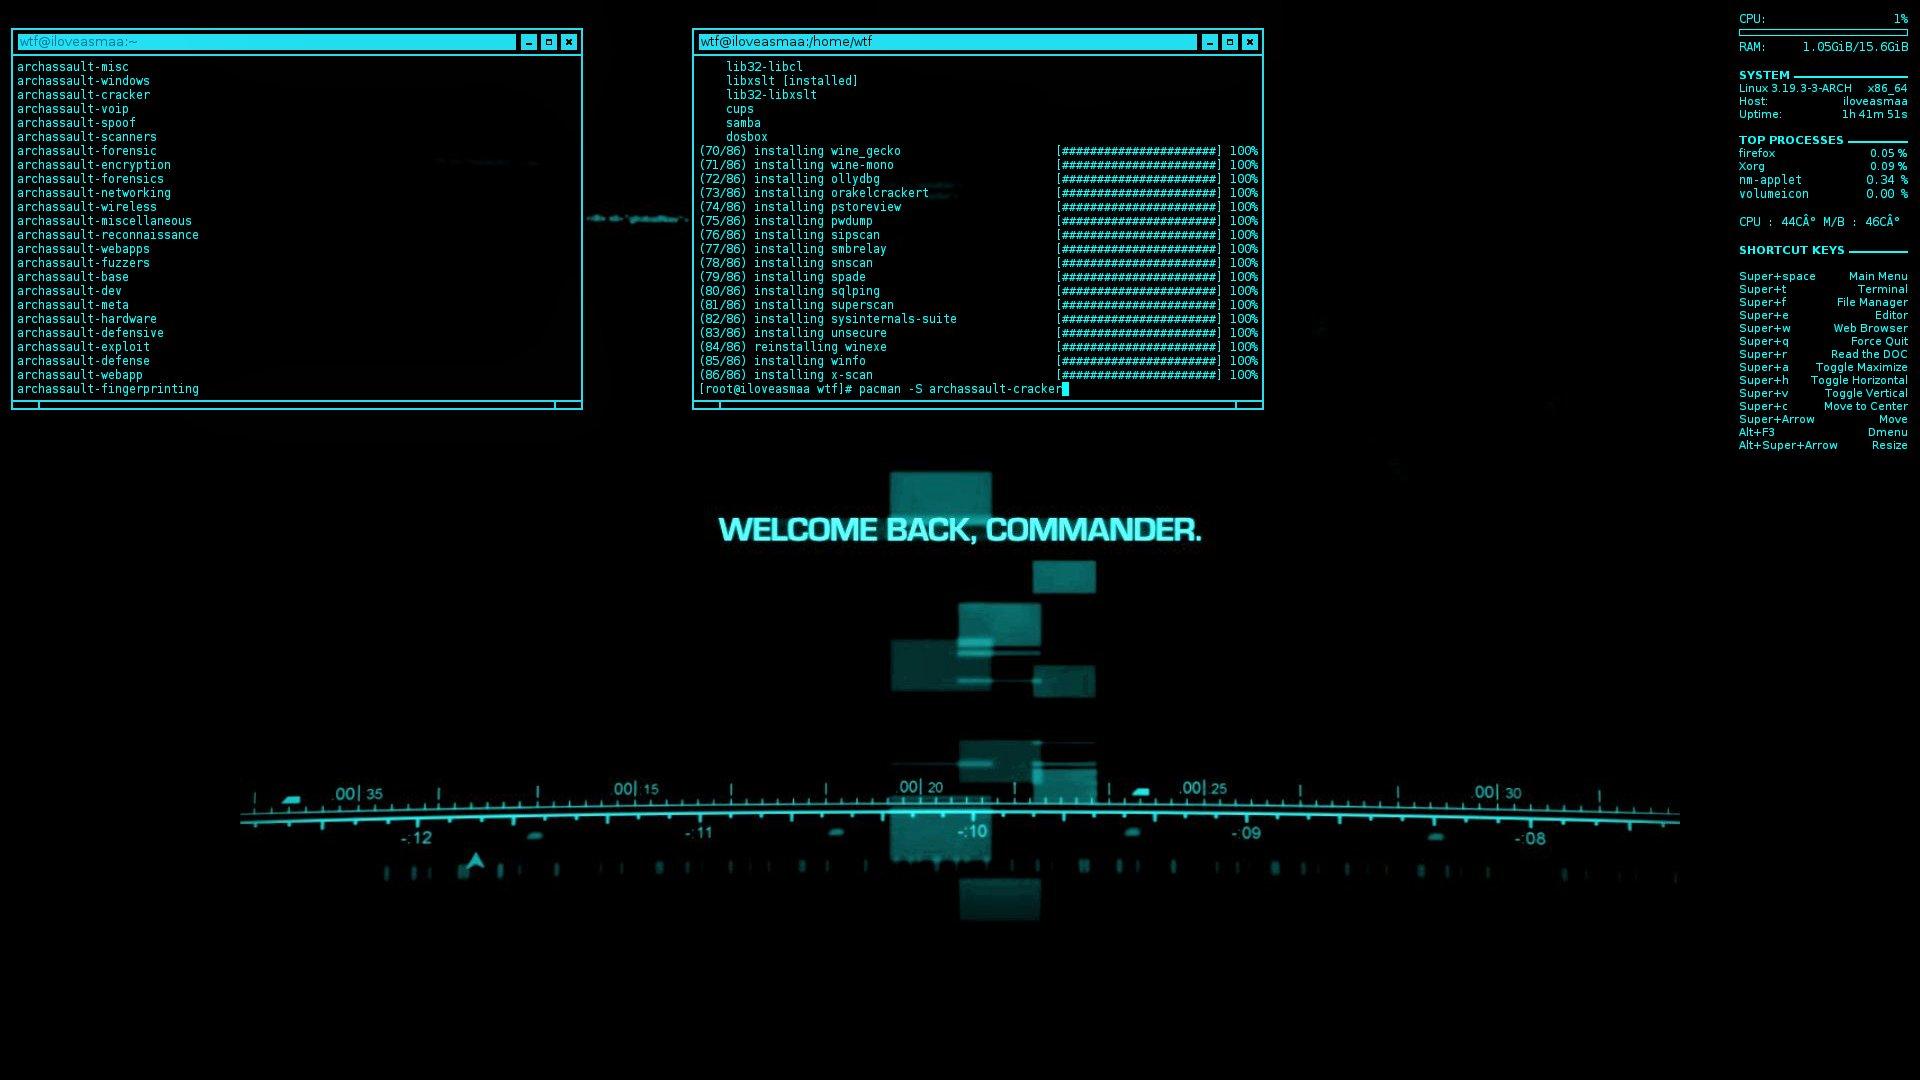 hacker wallpaper 1920x1080 - photo #4